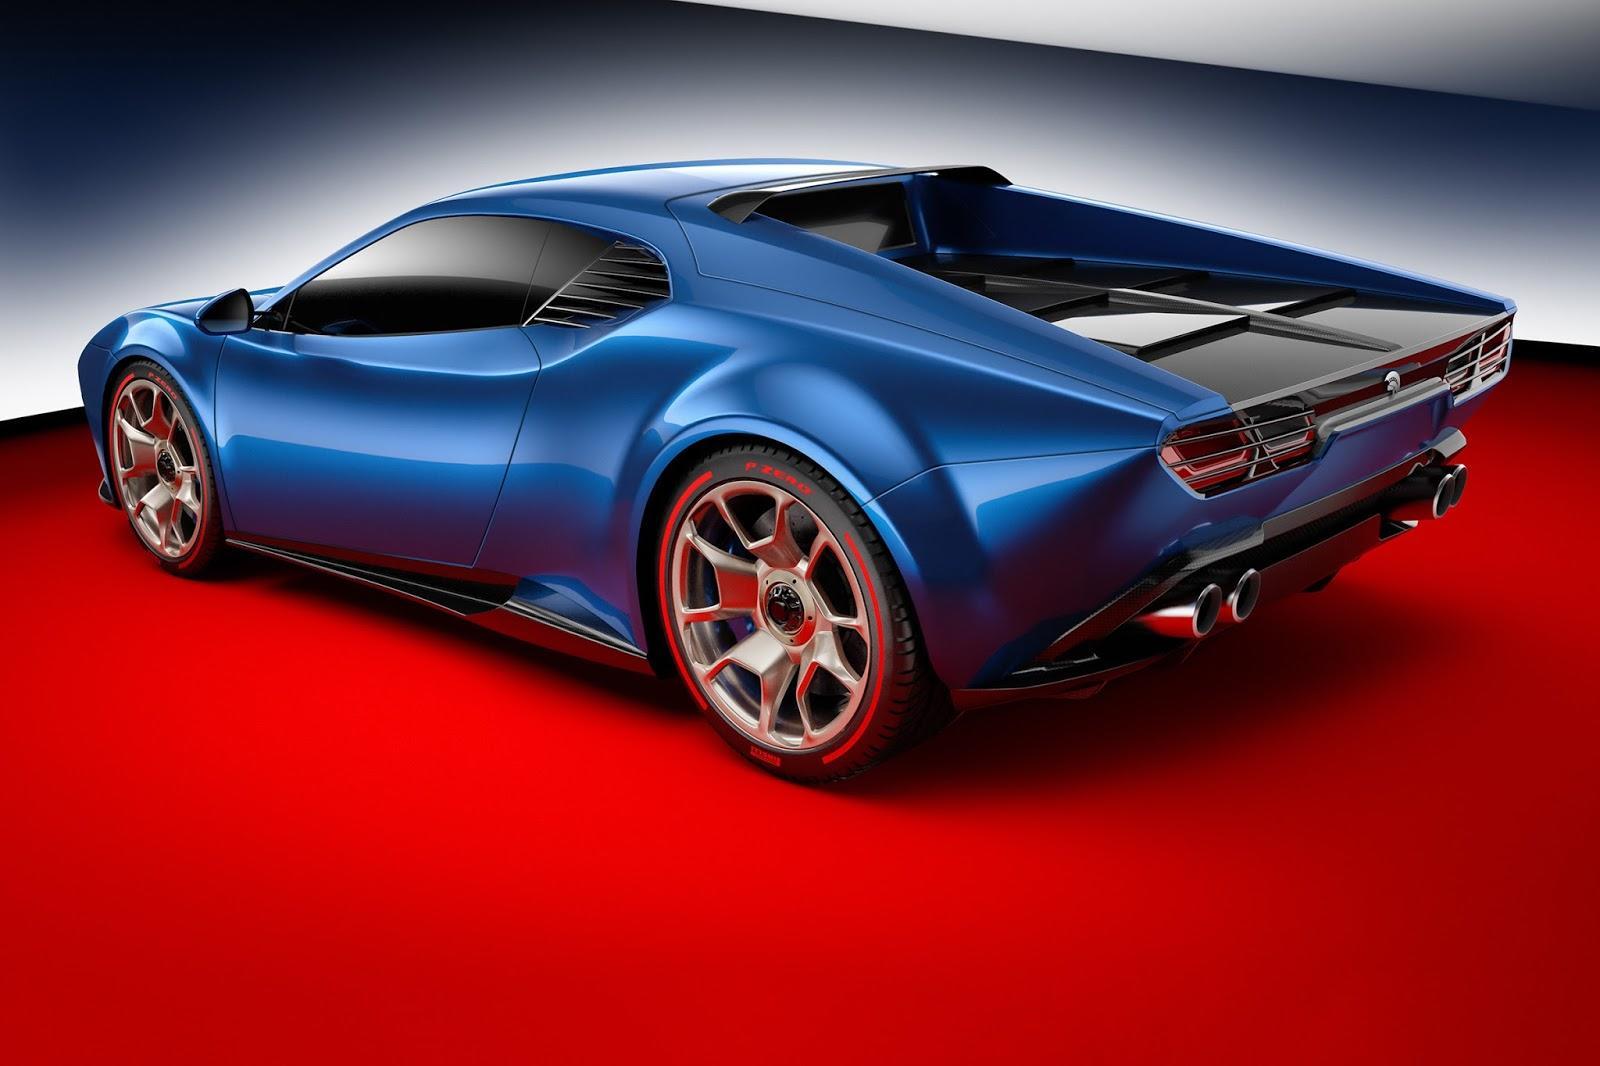 De-Tomaso-Pantera-ARES-Design-Project-Panther-Tuning-2